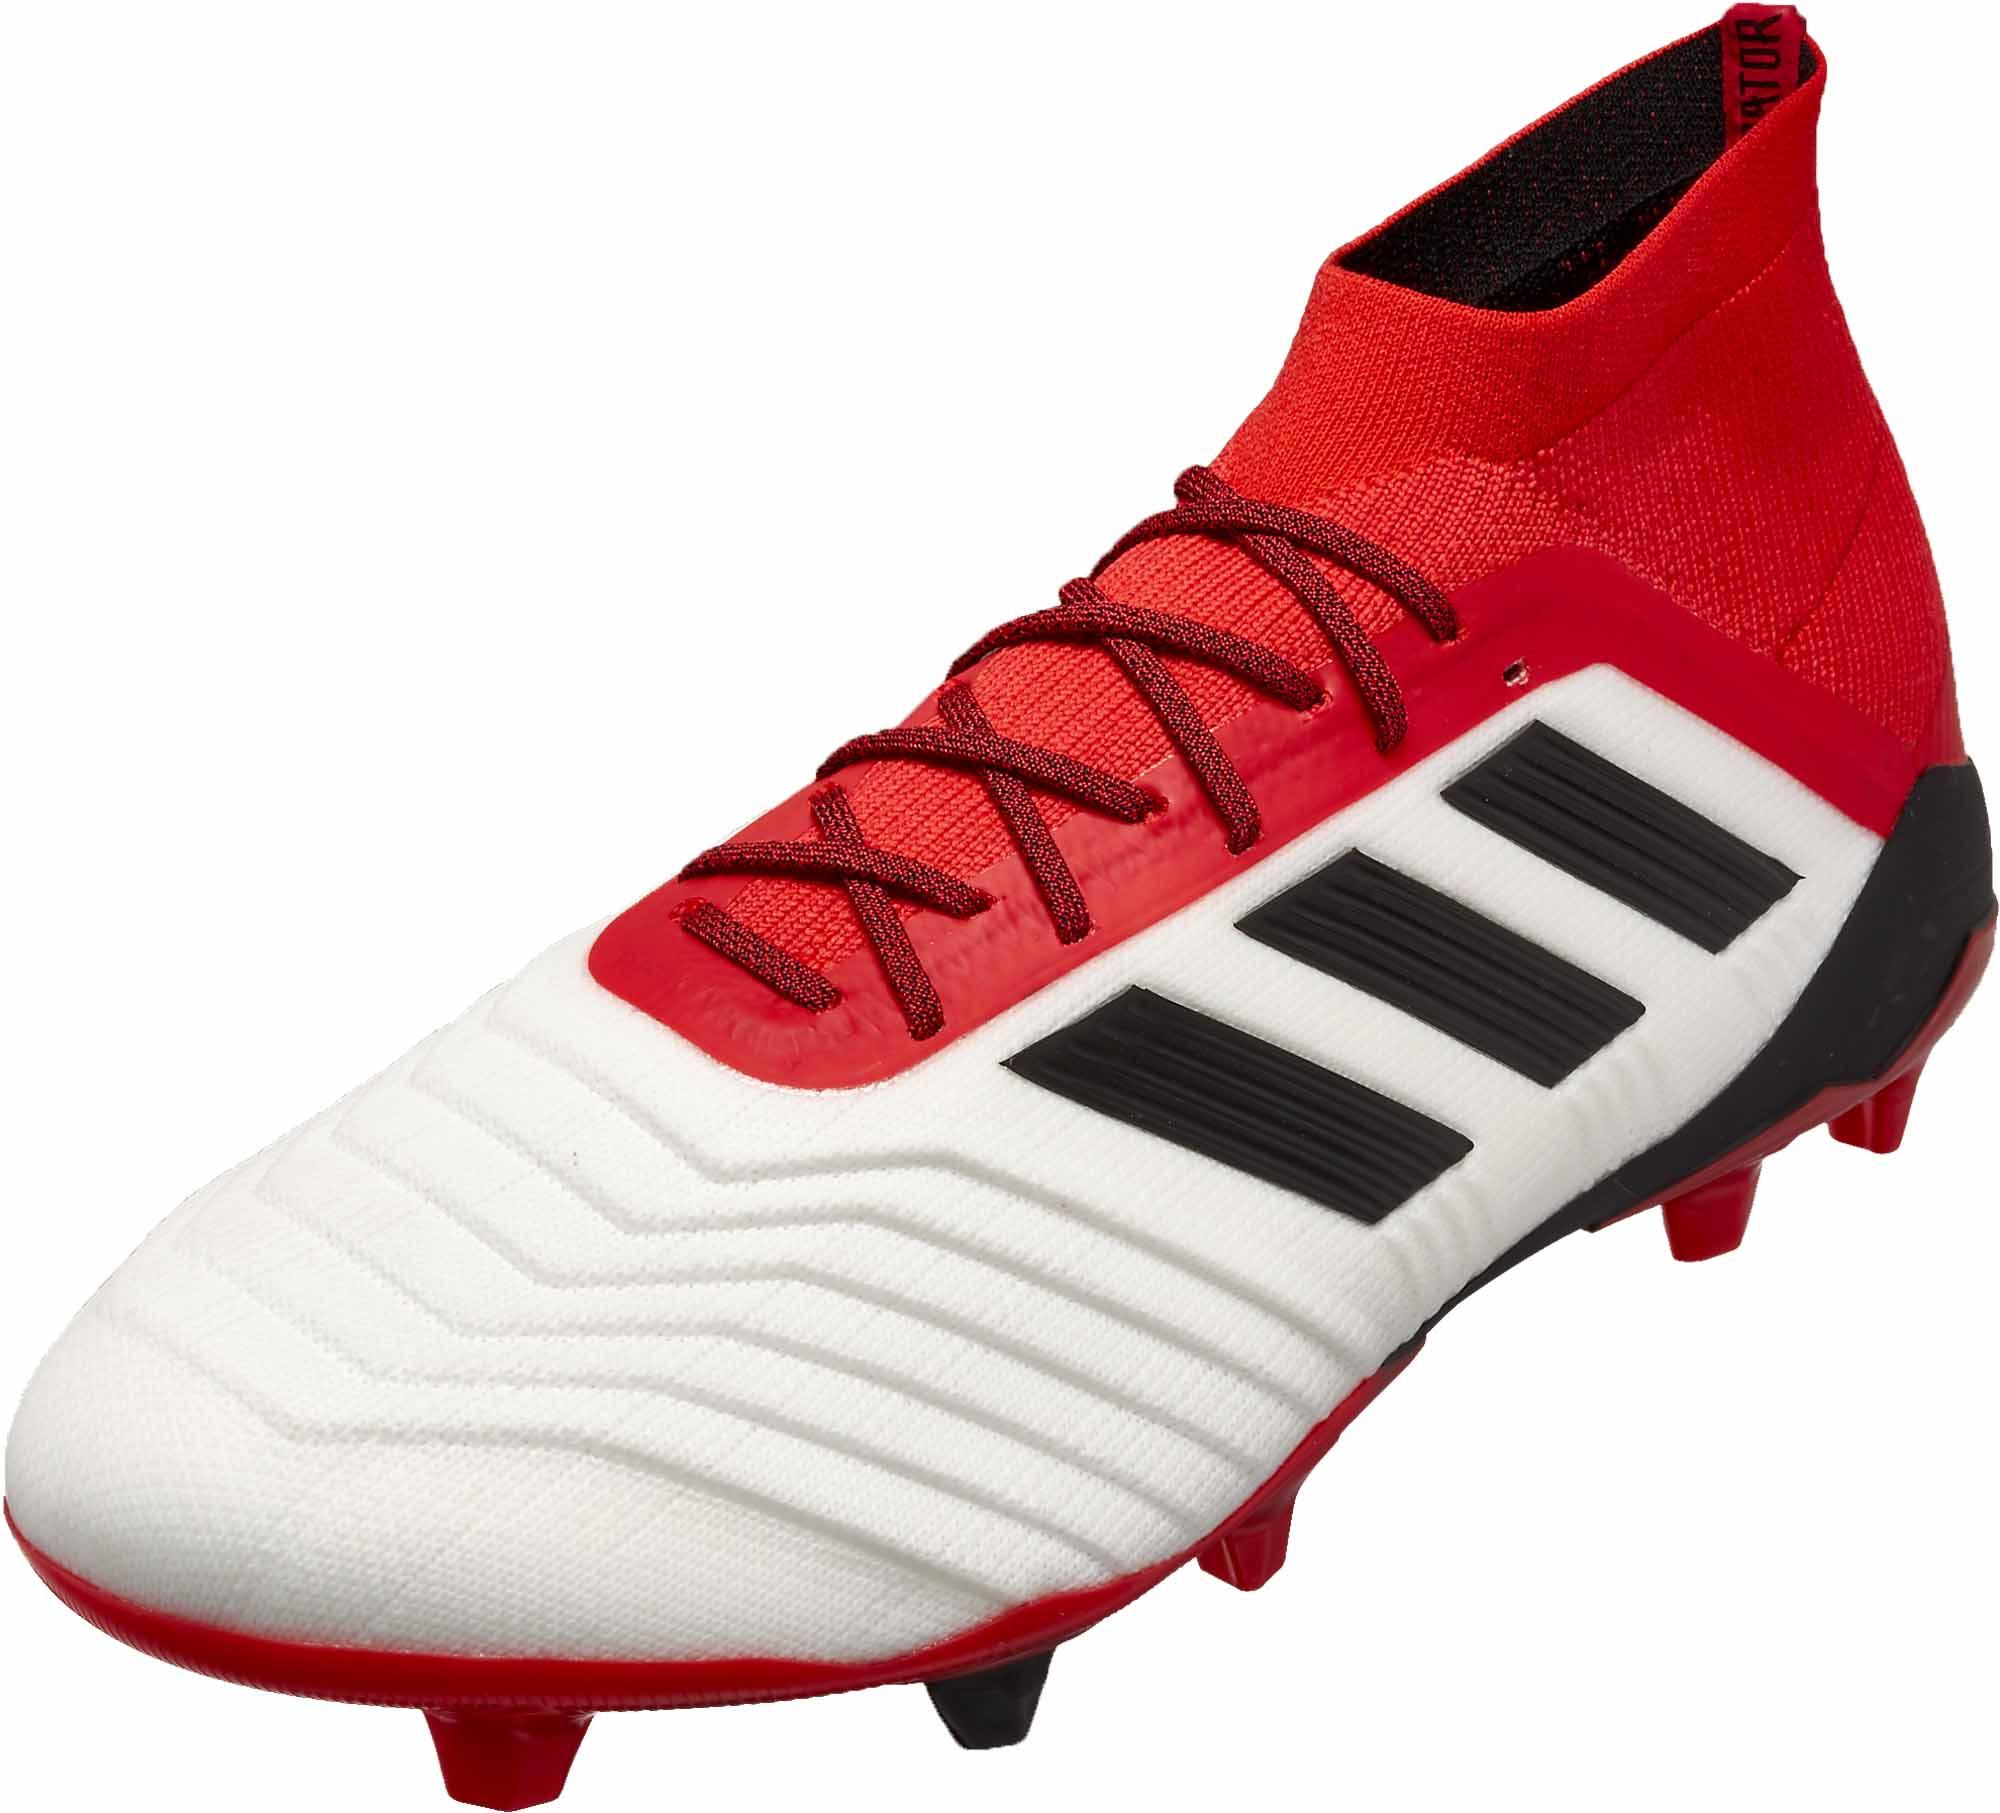 c736dab4fd9 adidas Predator 18.1 FG - White   Real Coral - Soccer Master